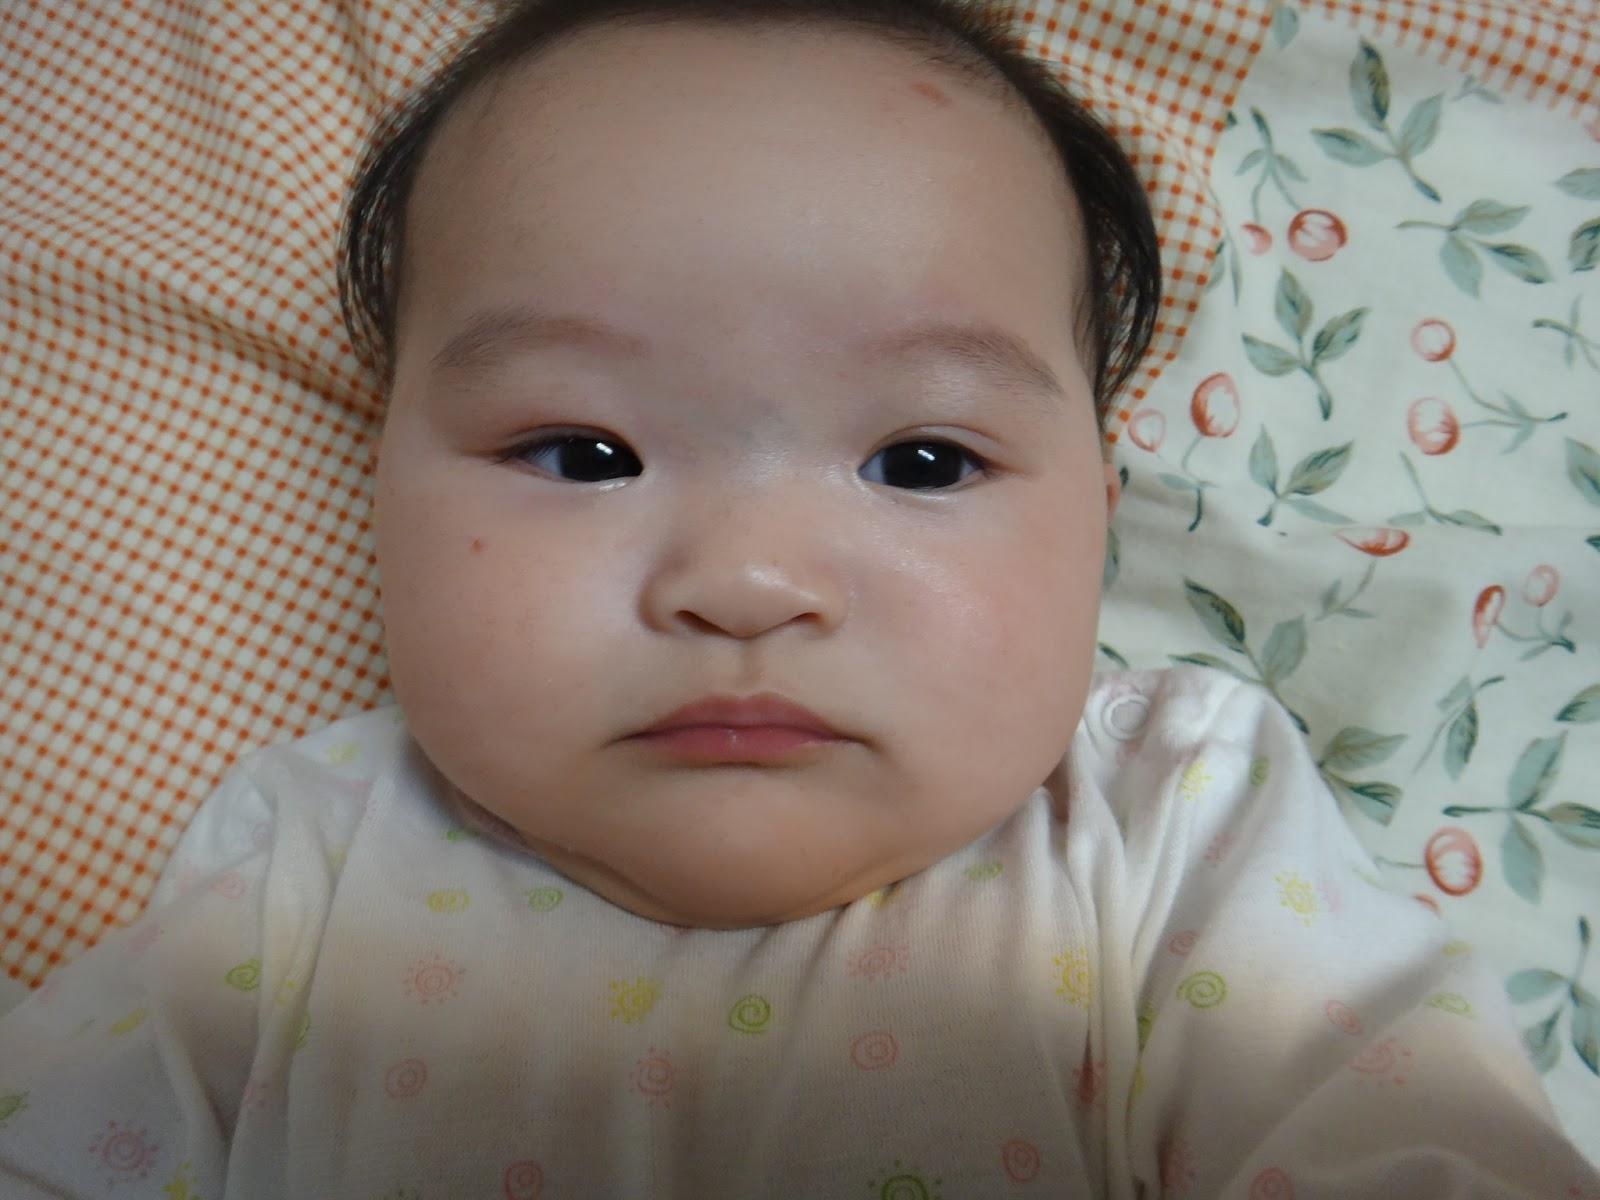 Babyhome 小BABY宸瑀的成長部落格,紀錄BABY的點點滴滴。: BABY針眼治療篇